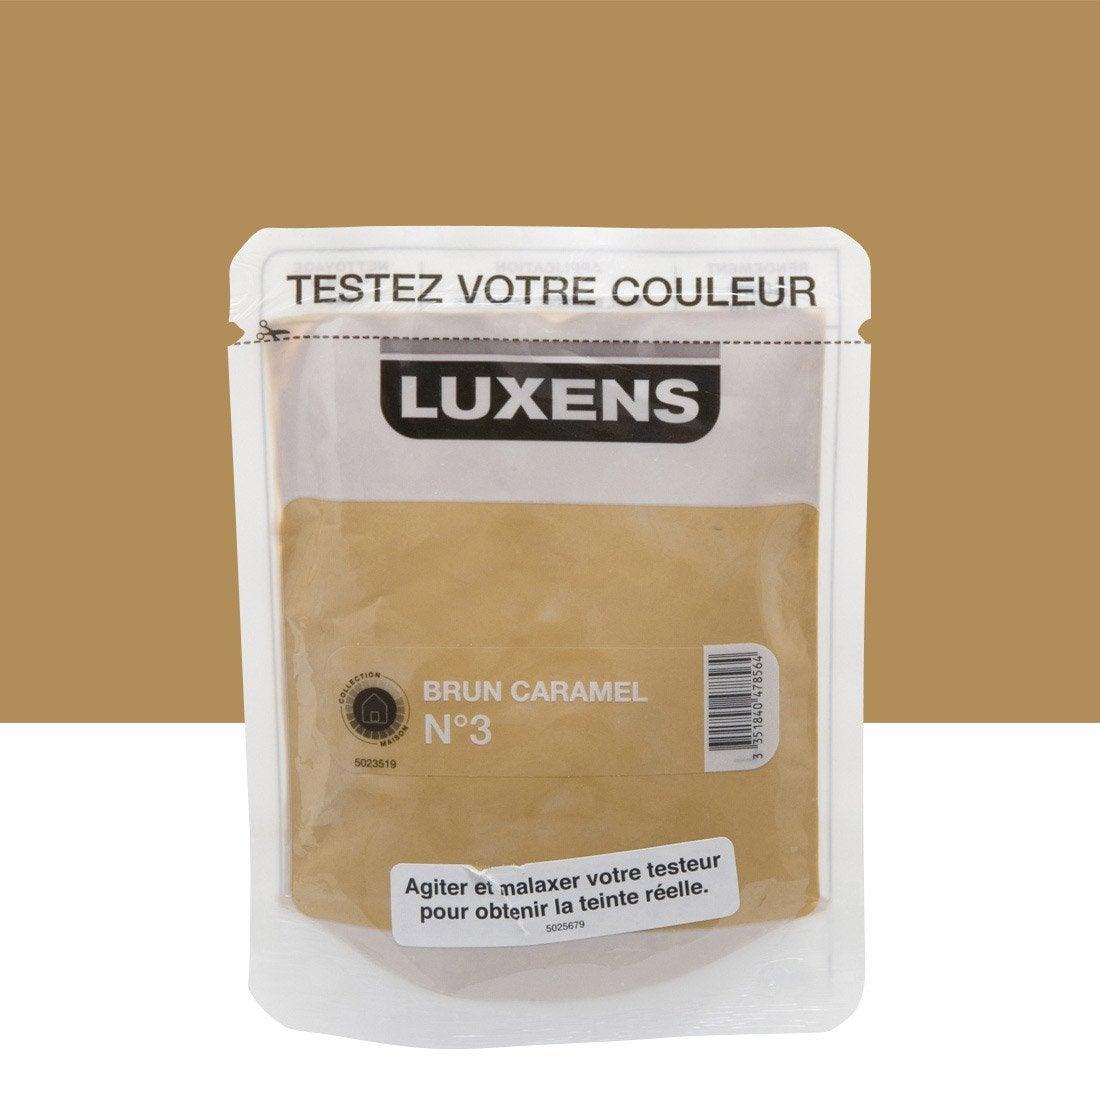 testeur peinture brun caramel 3 luxens couleurs int rieures satin l leroy merlin. Black Bedroom Furniture Sets. Home Design Ideas